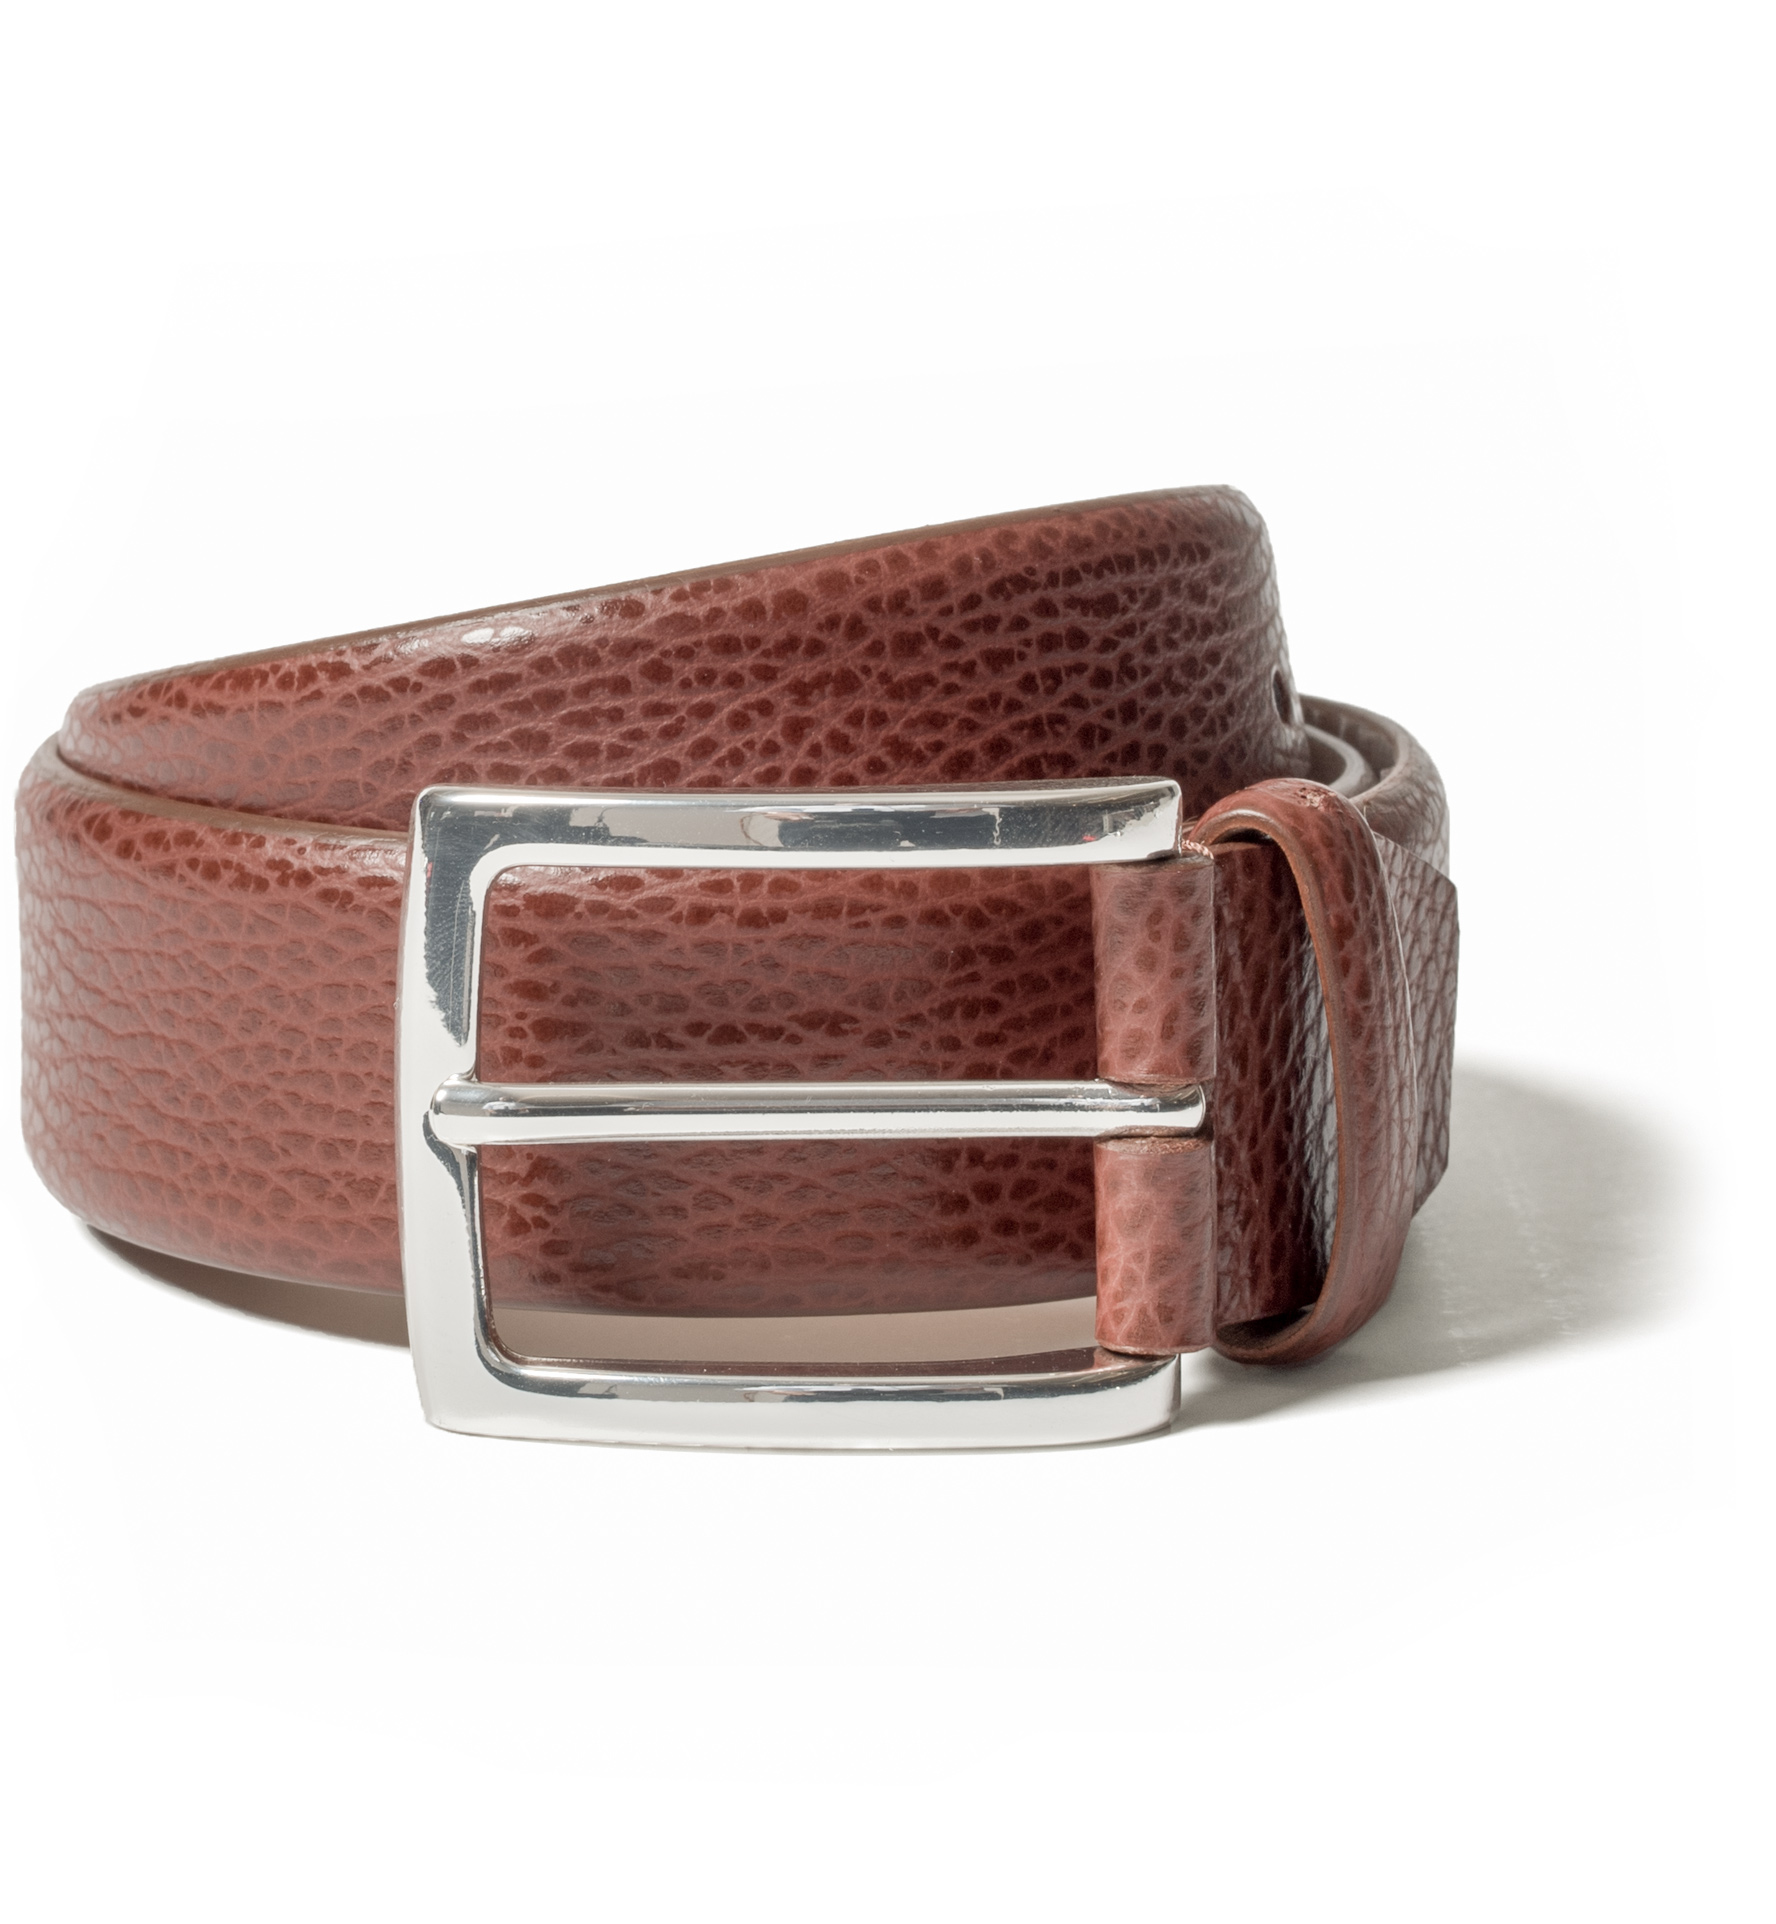 Zoom Image of Brown Pebble Grain Leather Belt